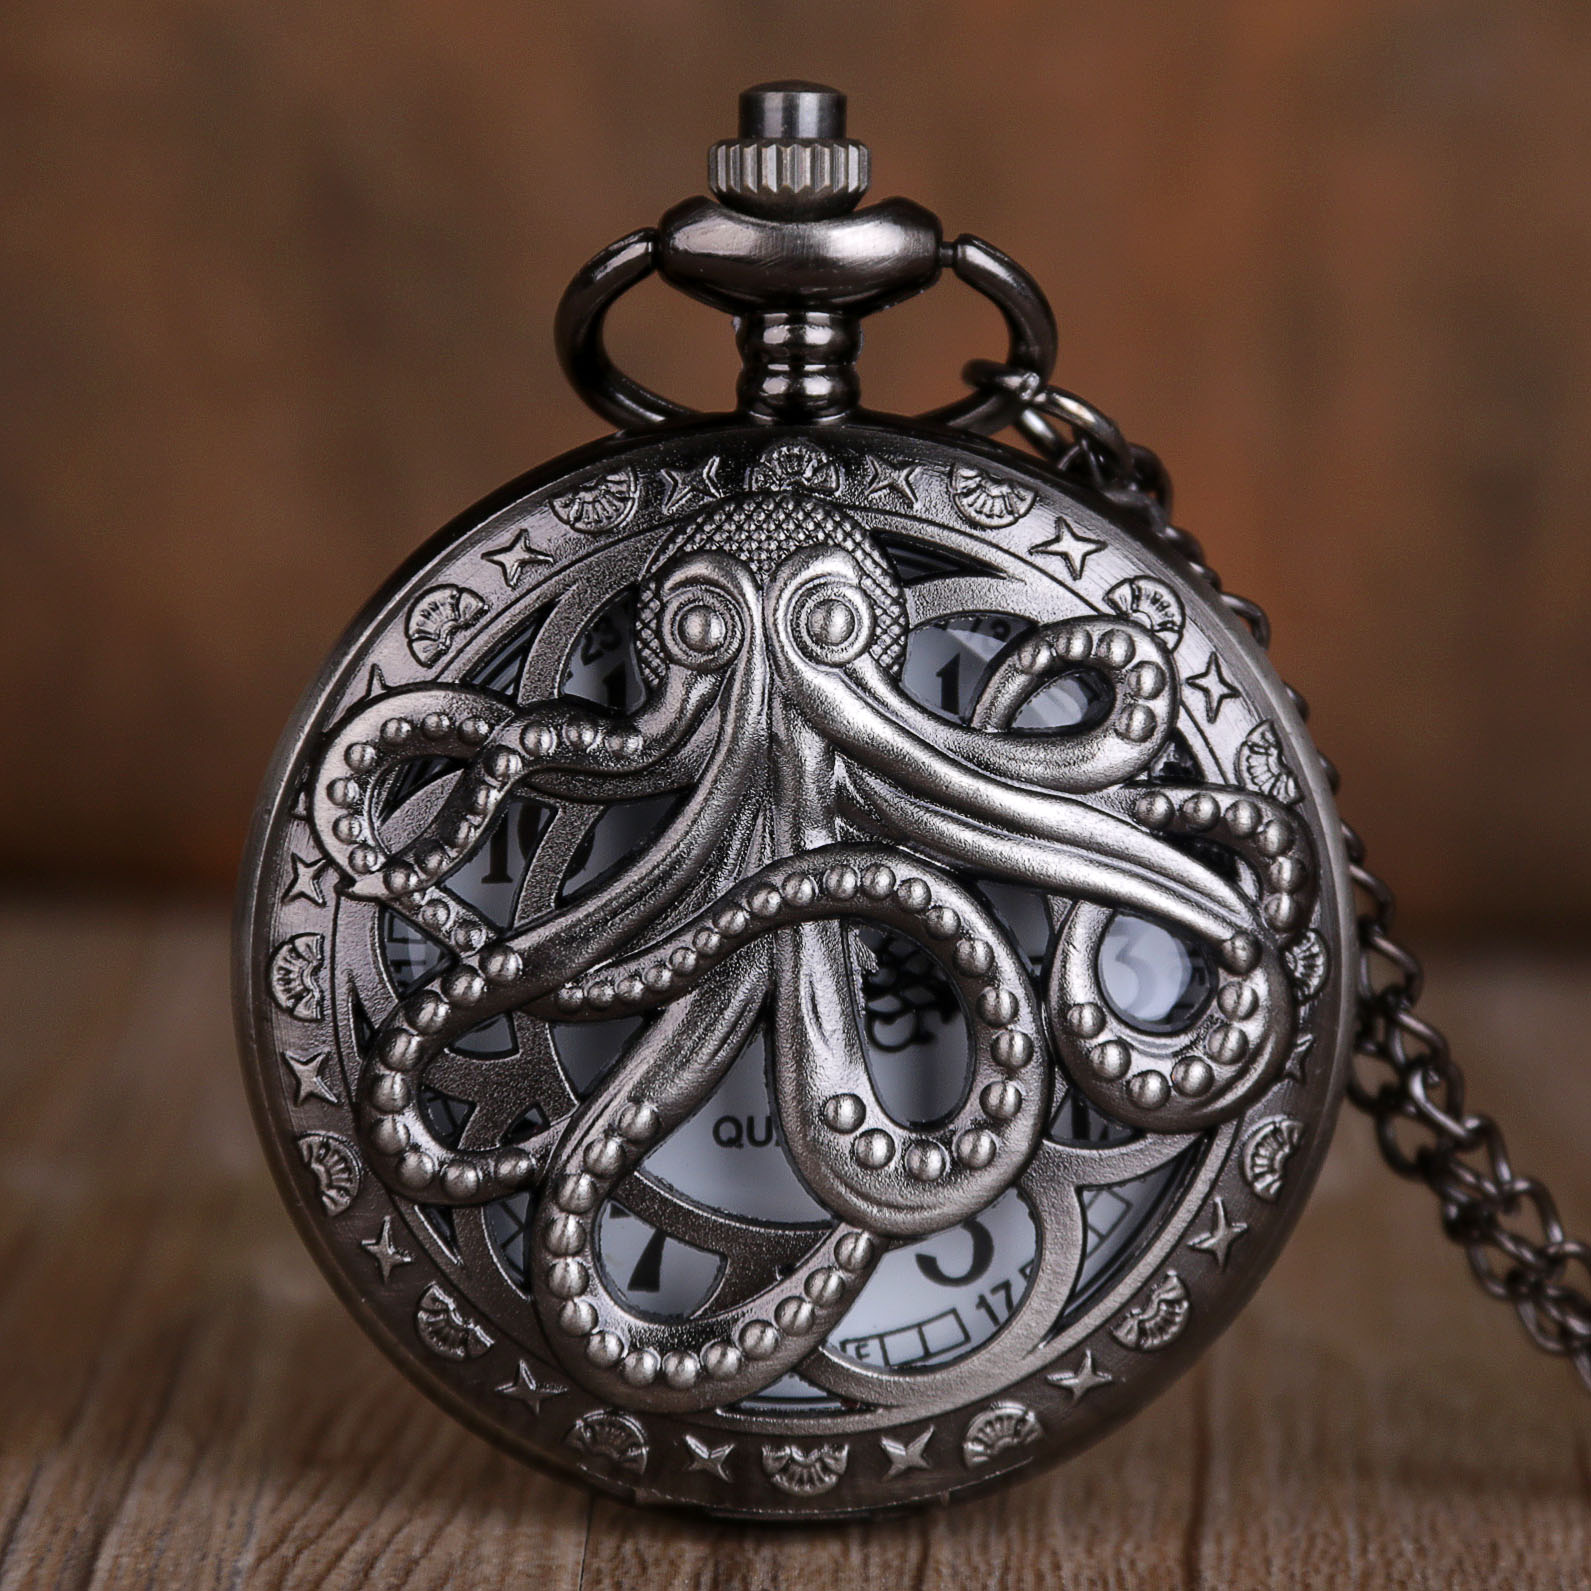 New Arrival Octopus Hollow Half Hunter Quartz Pocket Watch Vintage Black Pocket Watch With Necklace Chain Gift For Kid Men Women